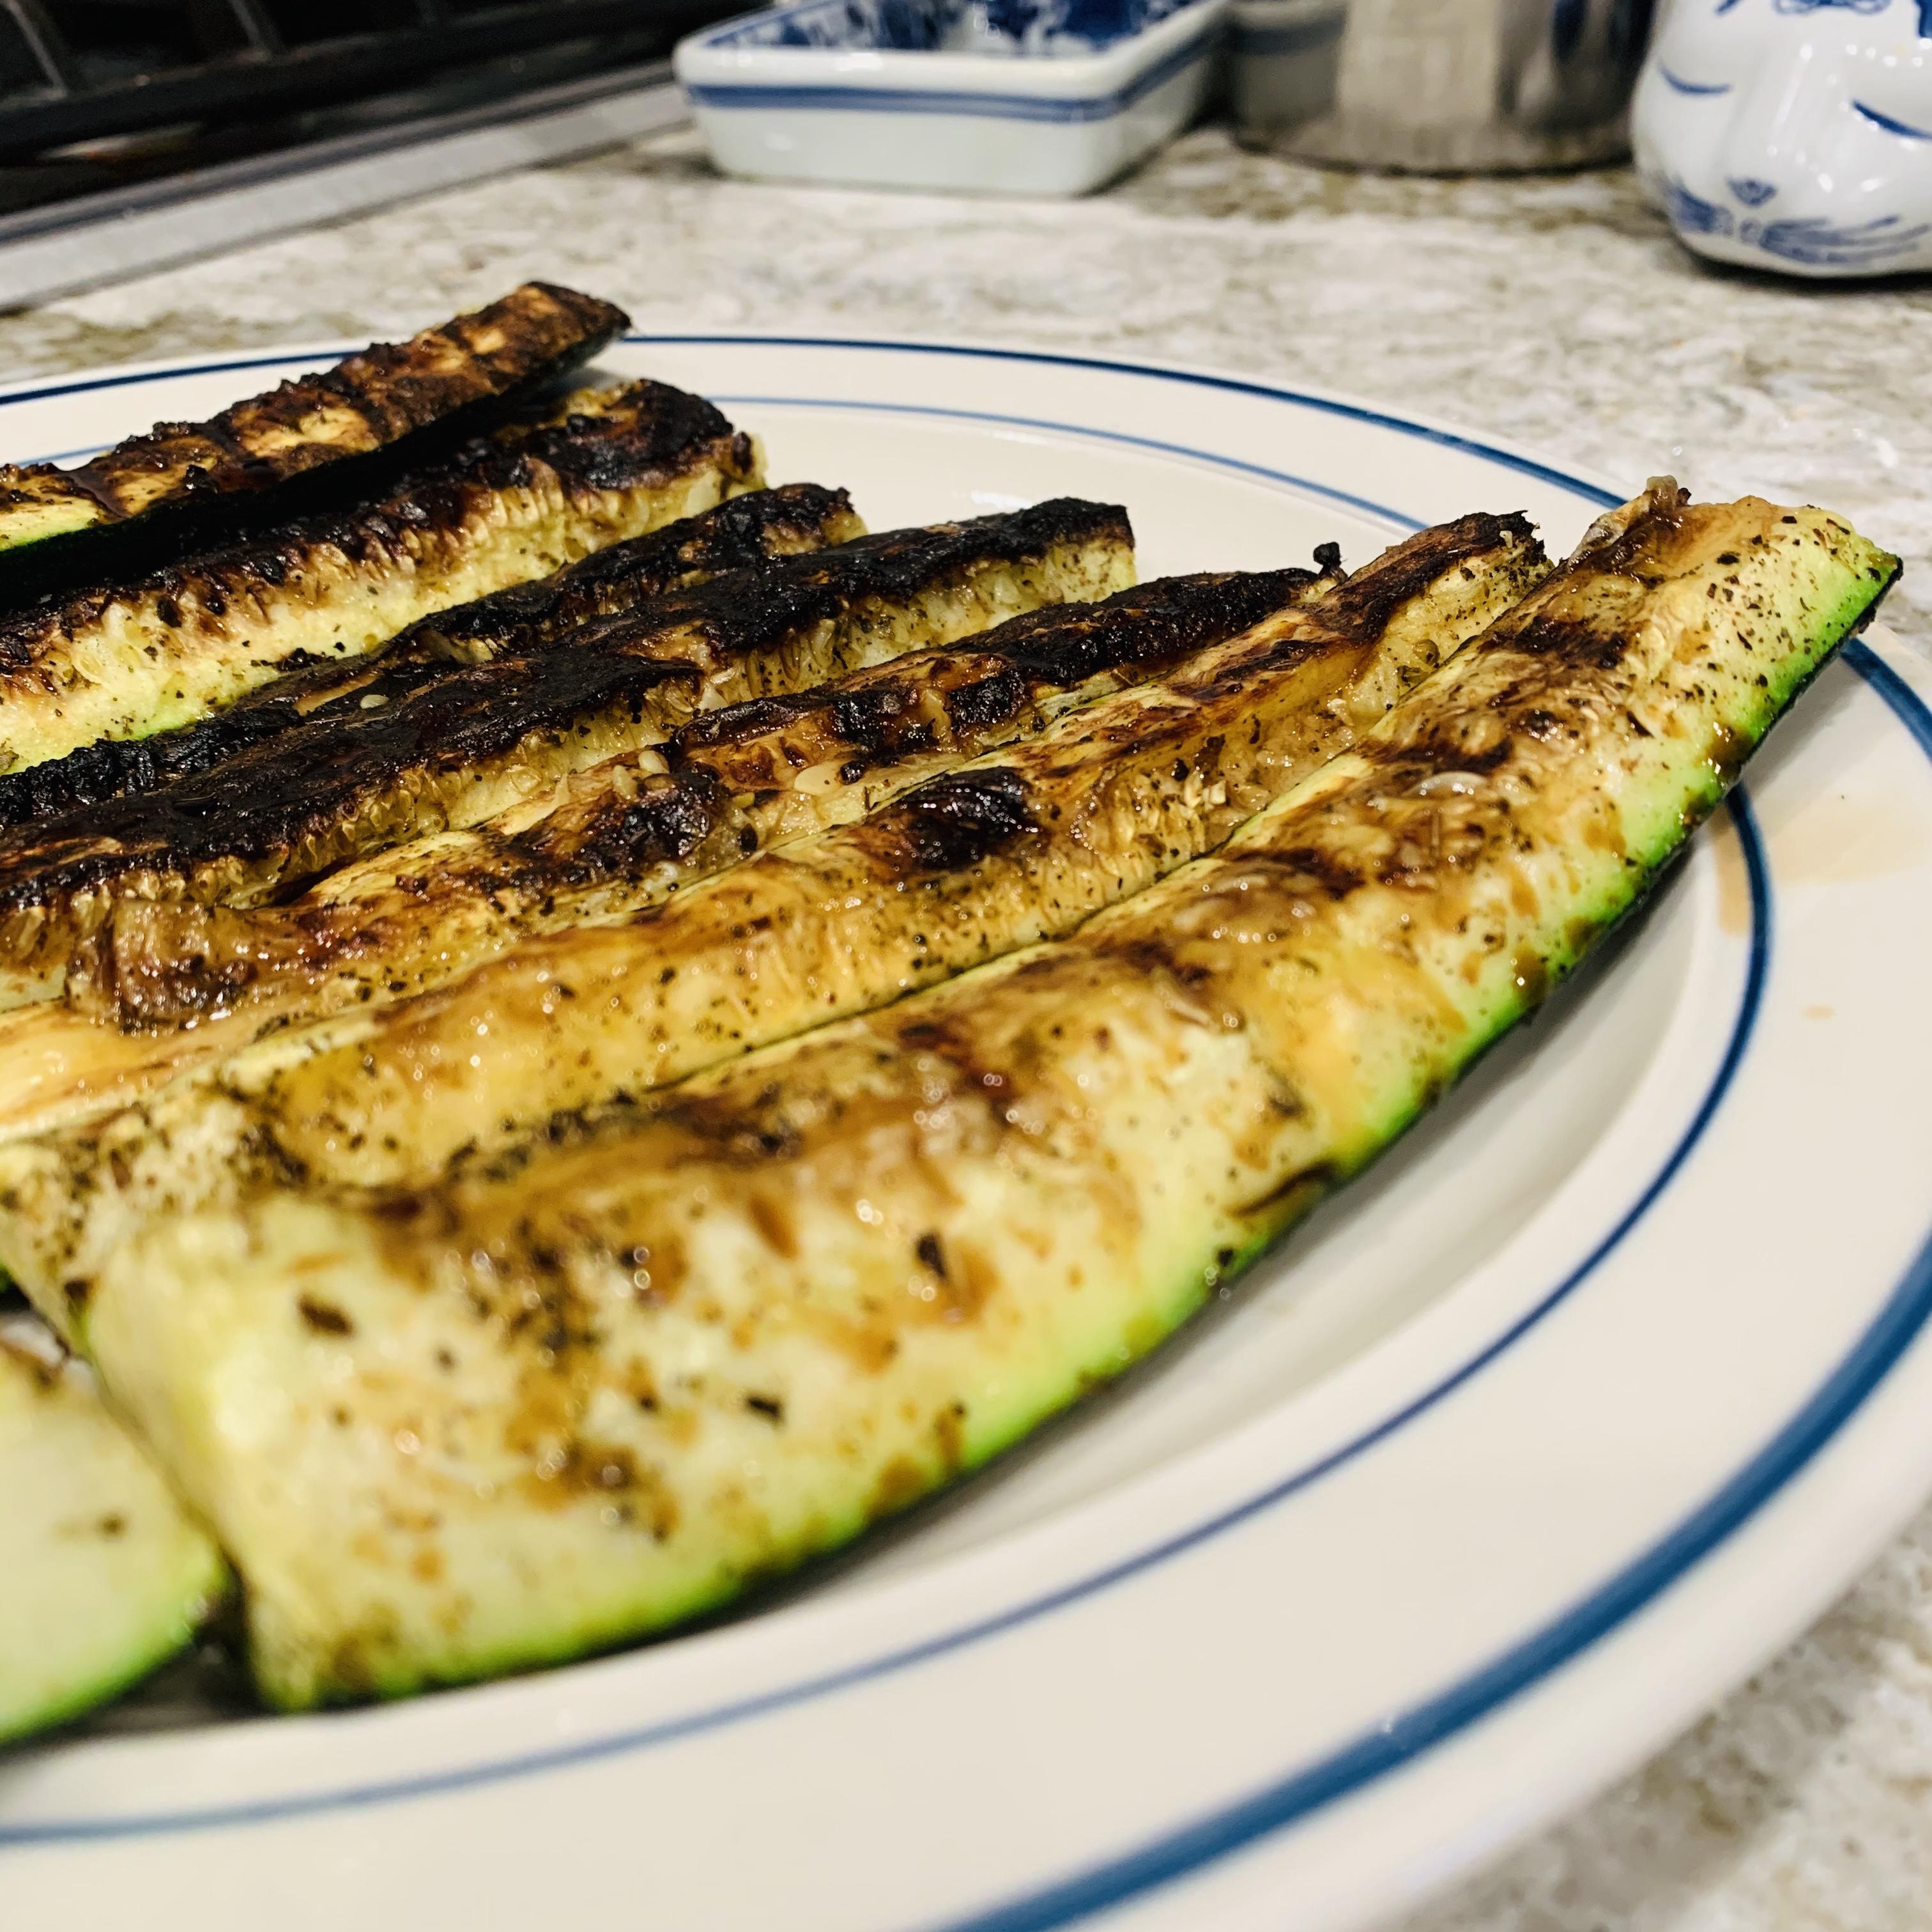 Balsamic Grilled Zucchini Kim Varley